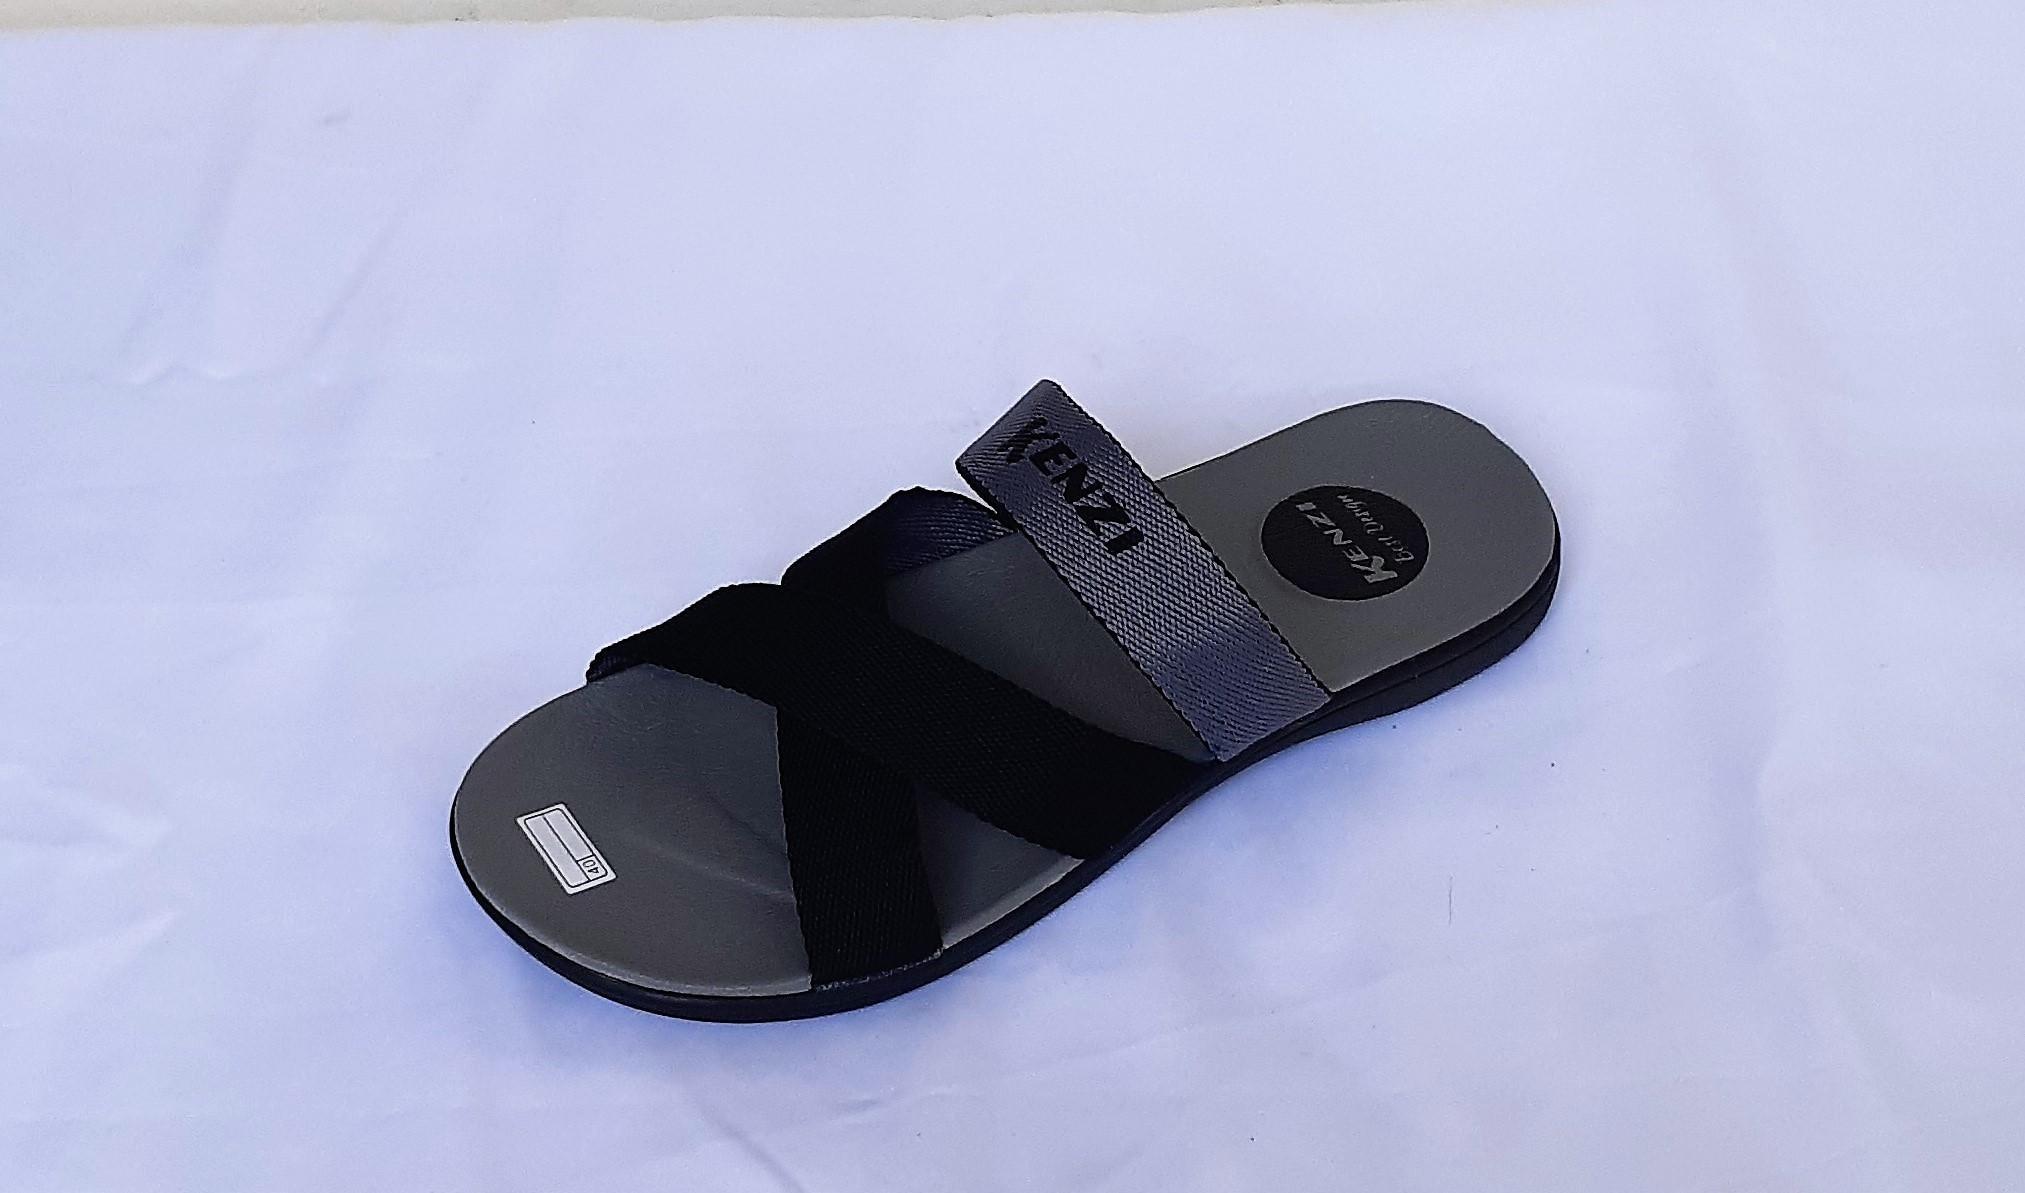 Detail Gambar Sandal fashion kenzi kokop model terbaru Pria/Wanita hitam abu-abu-SK-Divajaya Shop Terbaru